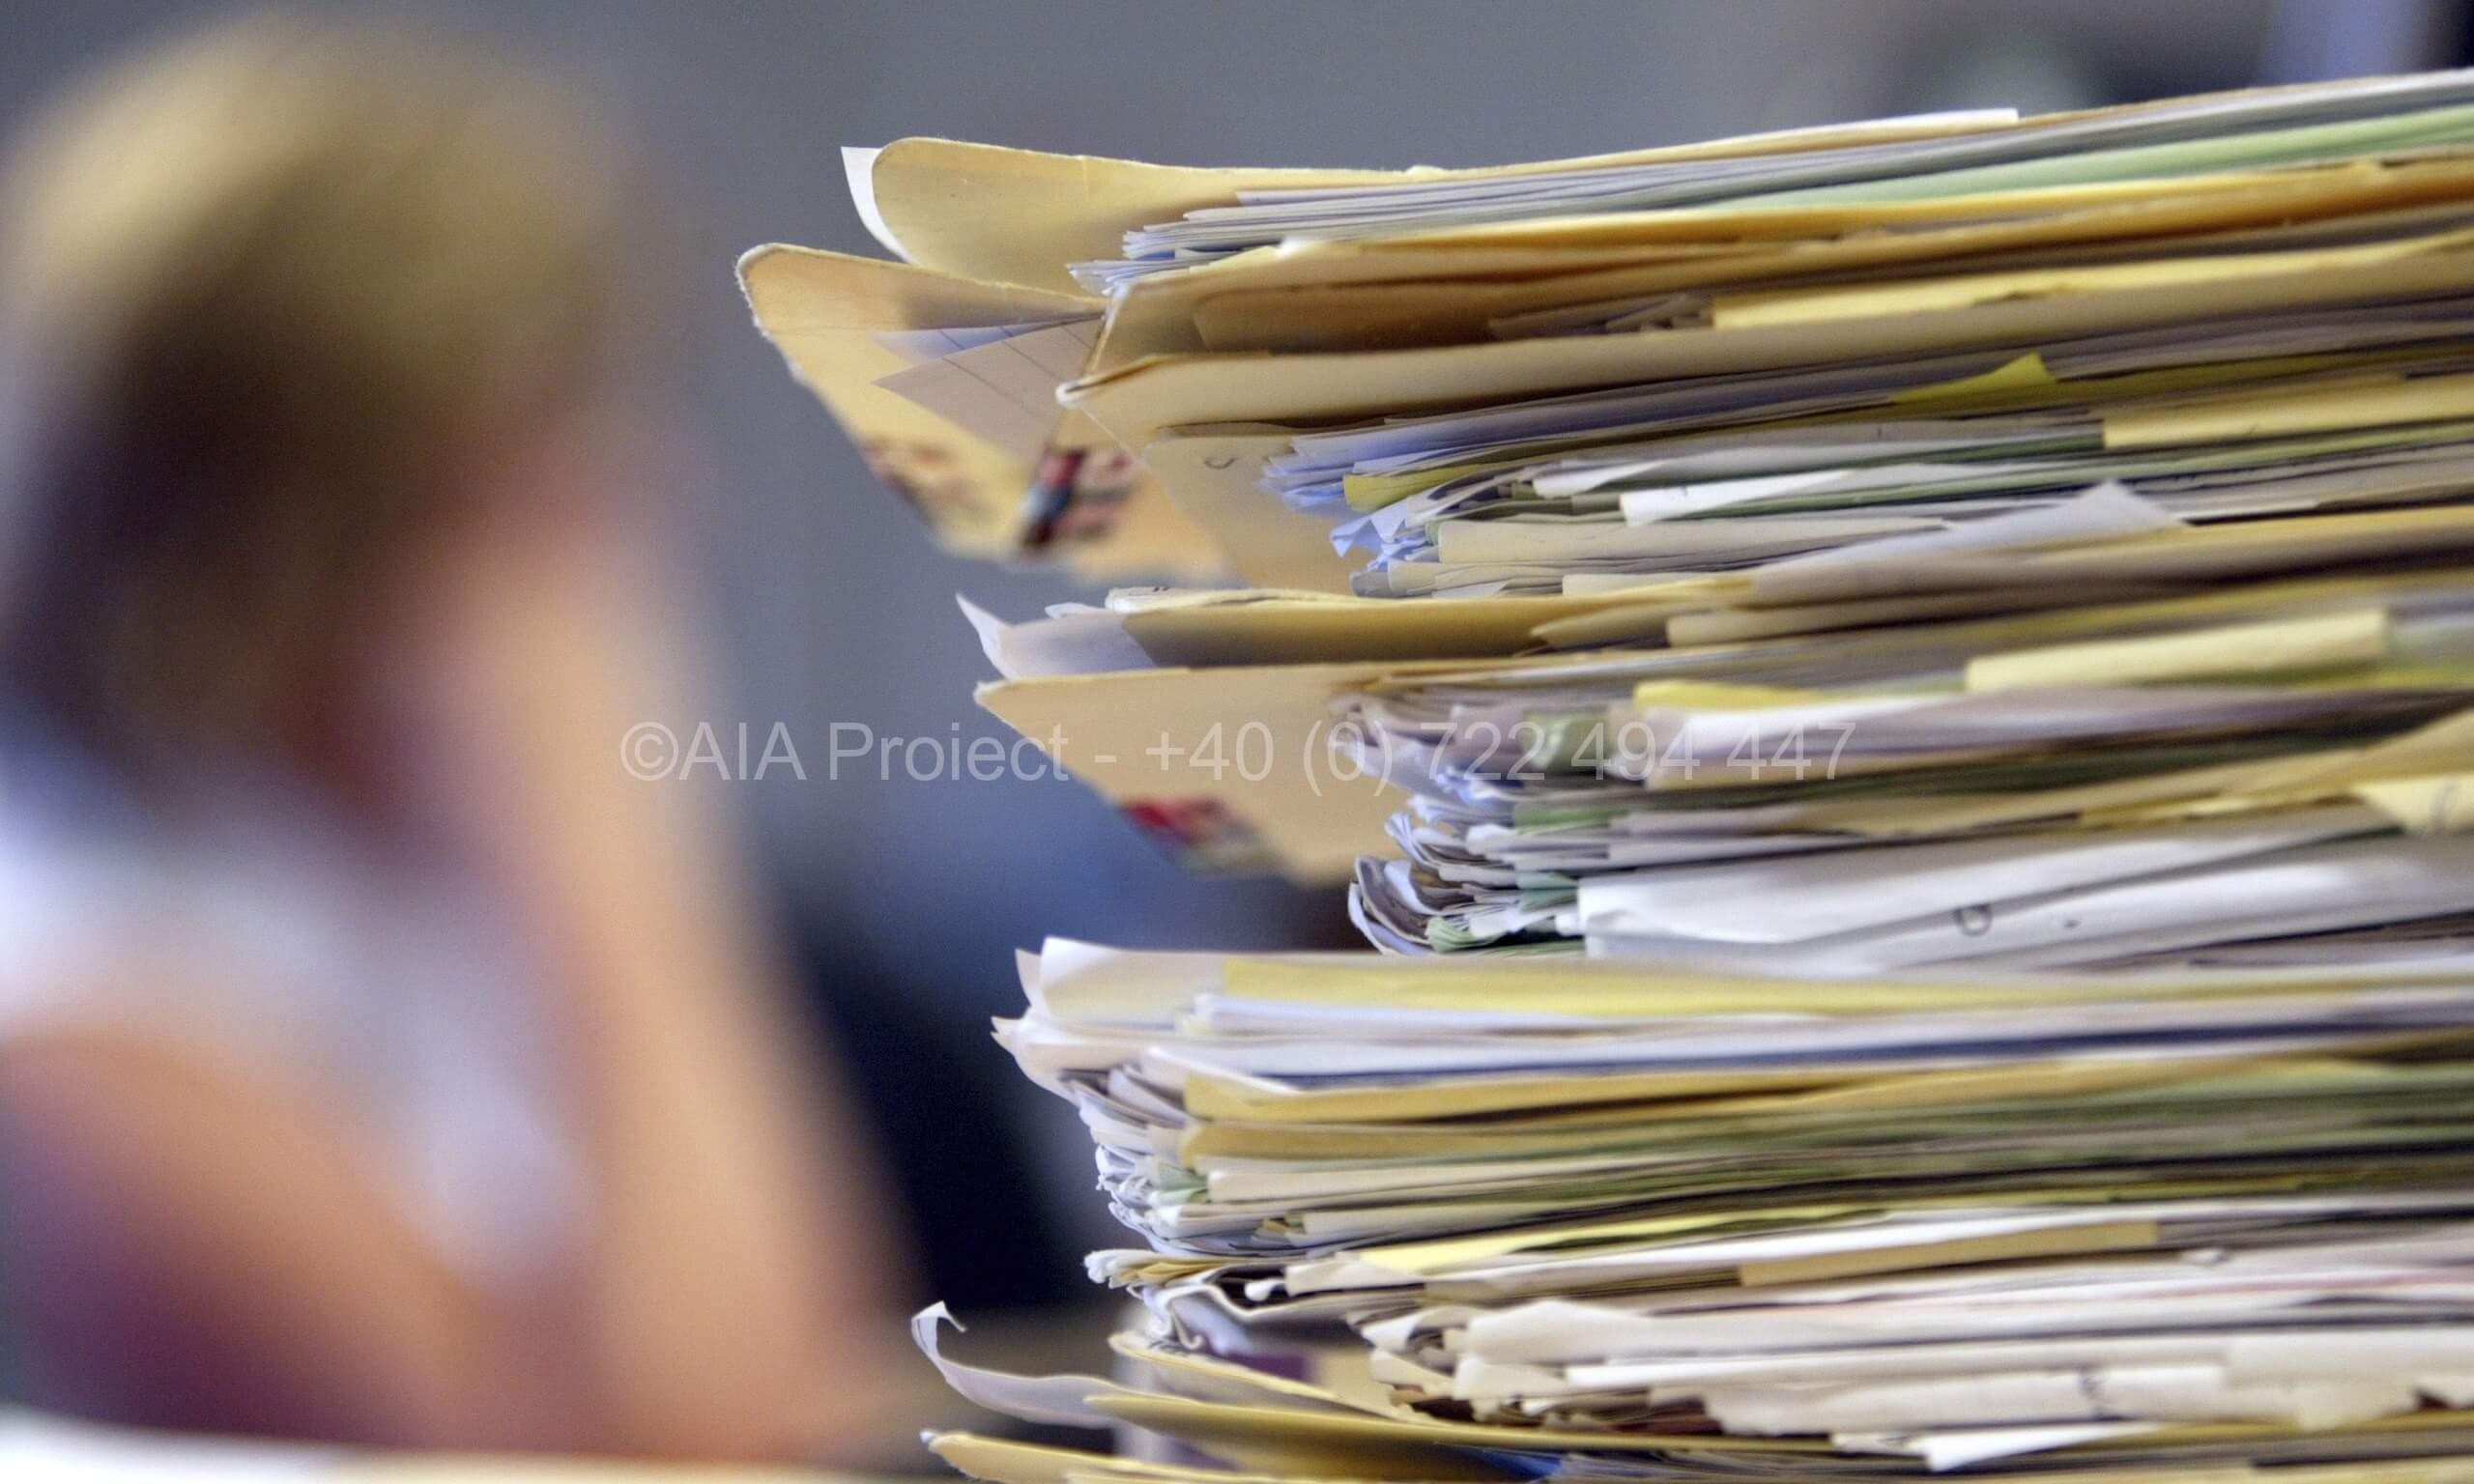 AIA Proiect va ajuta sa obtineti Acordul de Mediu si/sau Avizul de Mediu